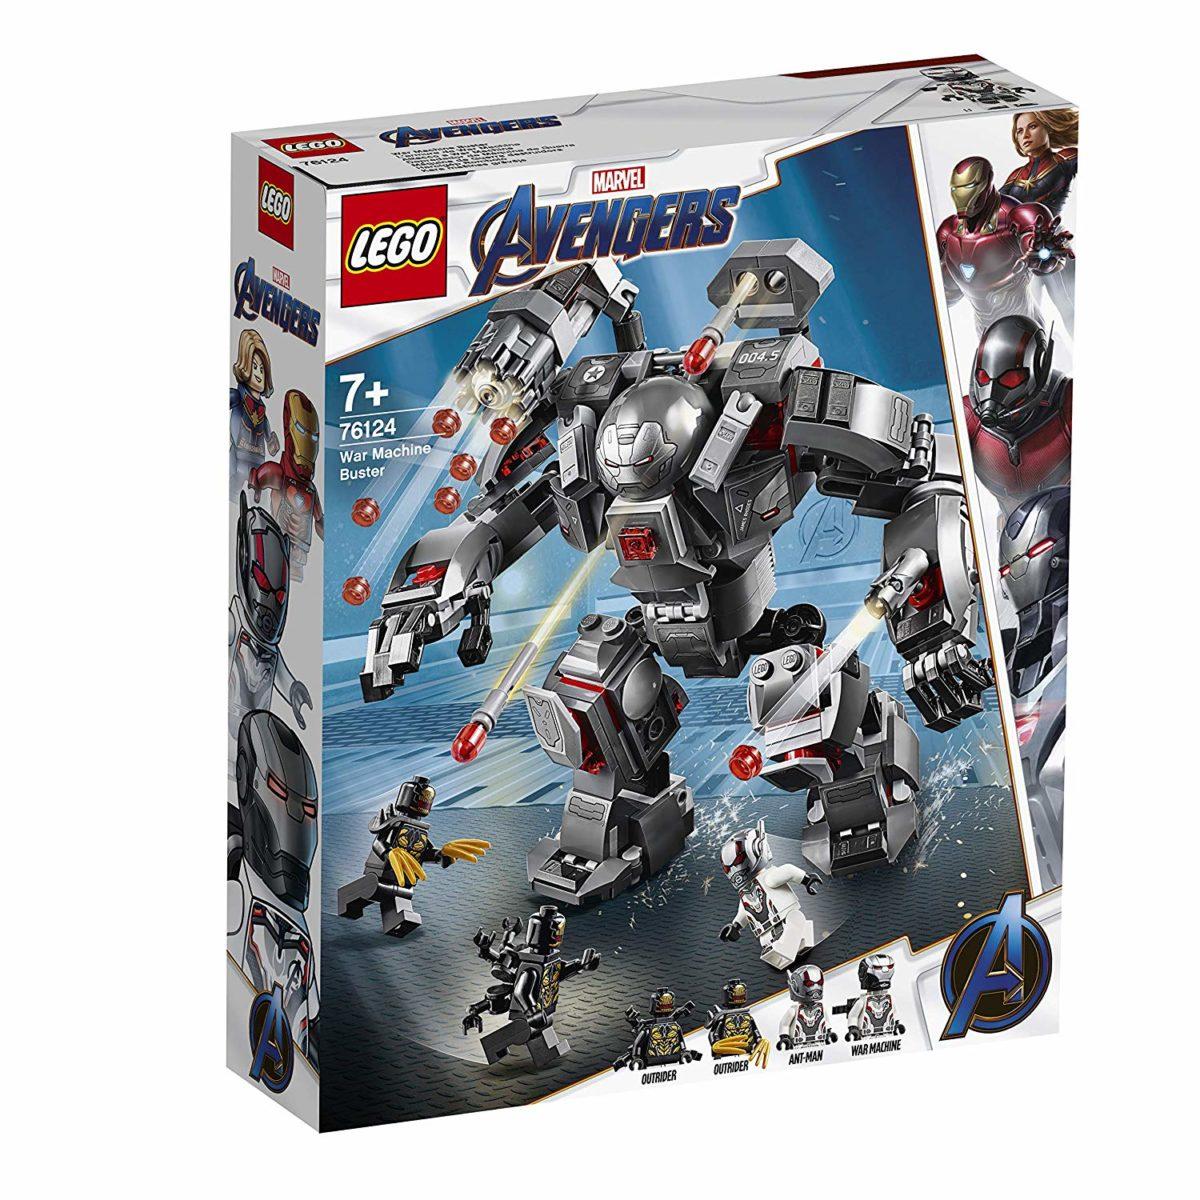 lego-avengers-endgame-war-machine-buster-76124-2019-box zusammengebaut.com